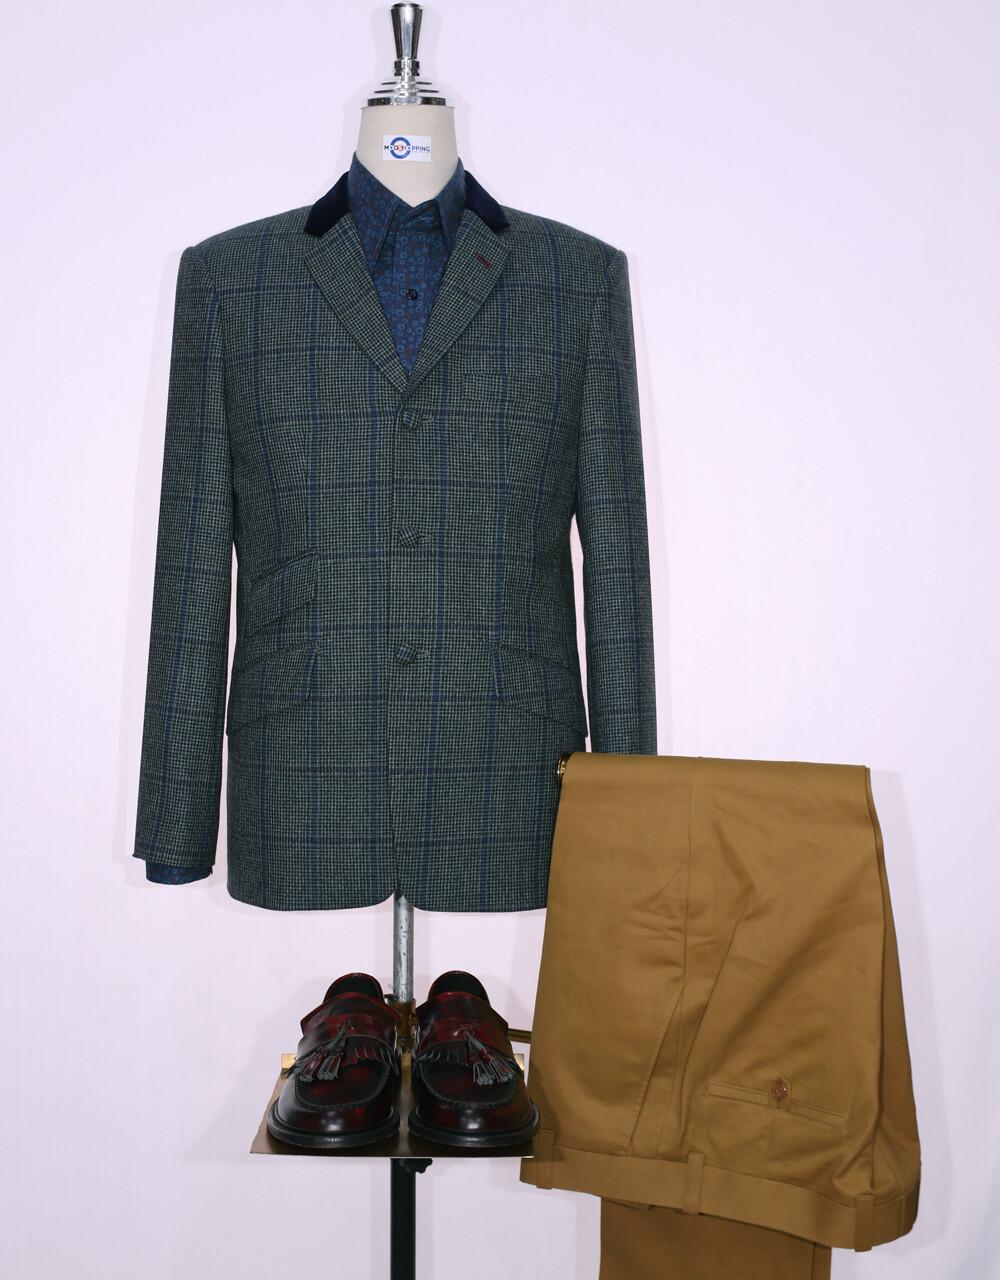 Tweed Jacket | Grey Green Windowpane Check 60s Style Jacket.